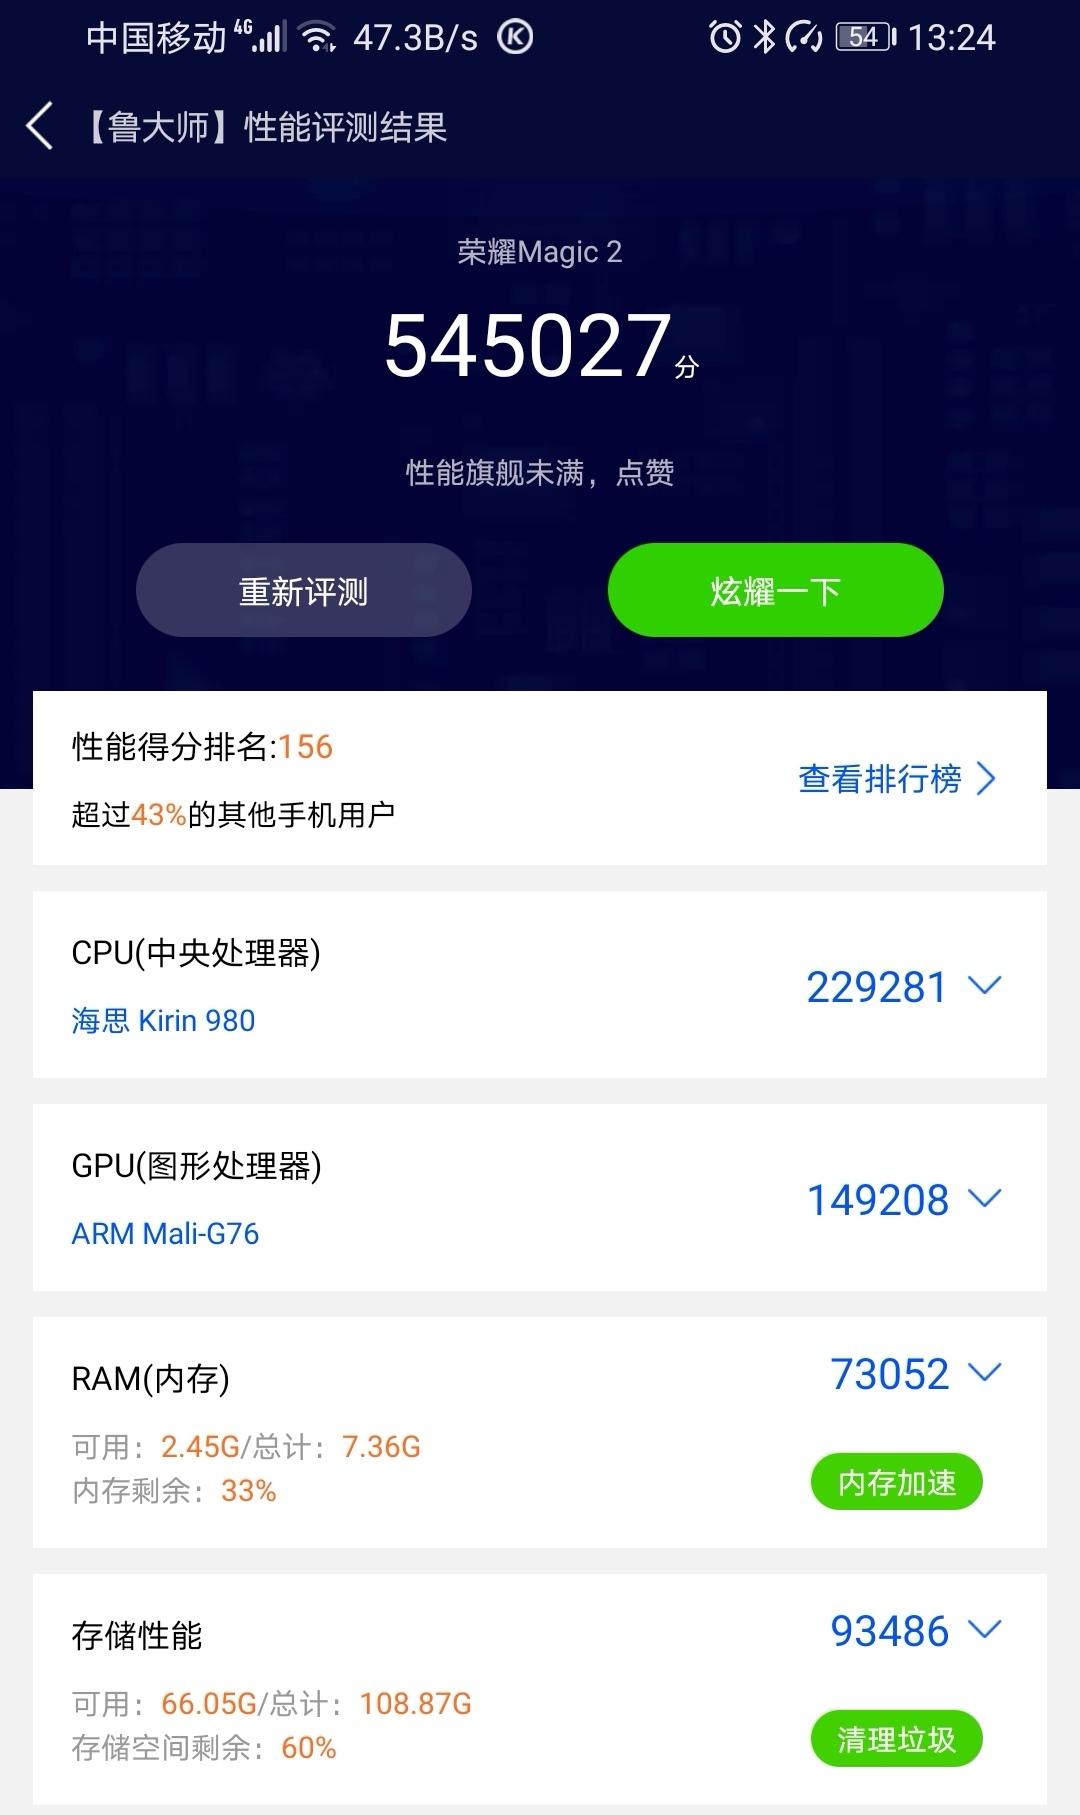 Screenshot_20210613_132438_com.ludashi.benchmark_edit_908828837767052.jpg